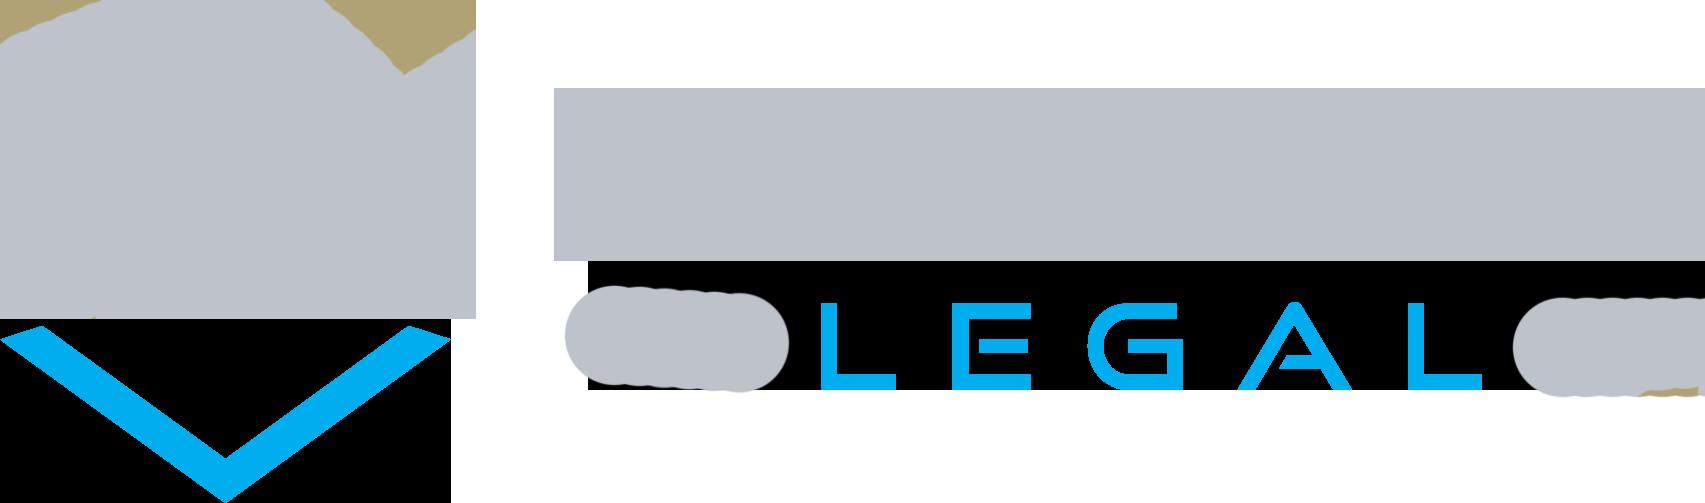 Criminal Lawyer Perth | Mark Andrews Legal